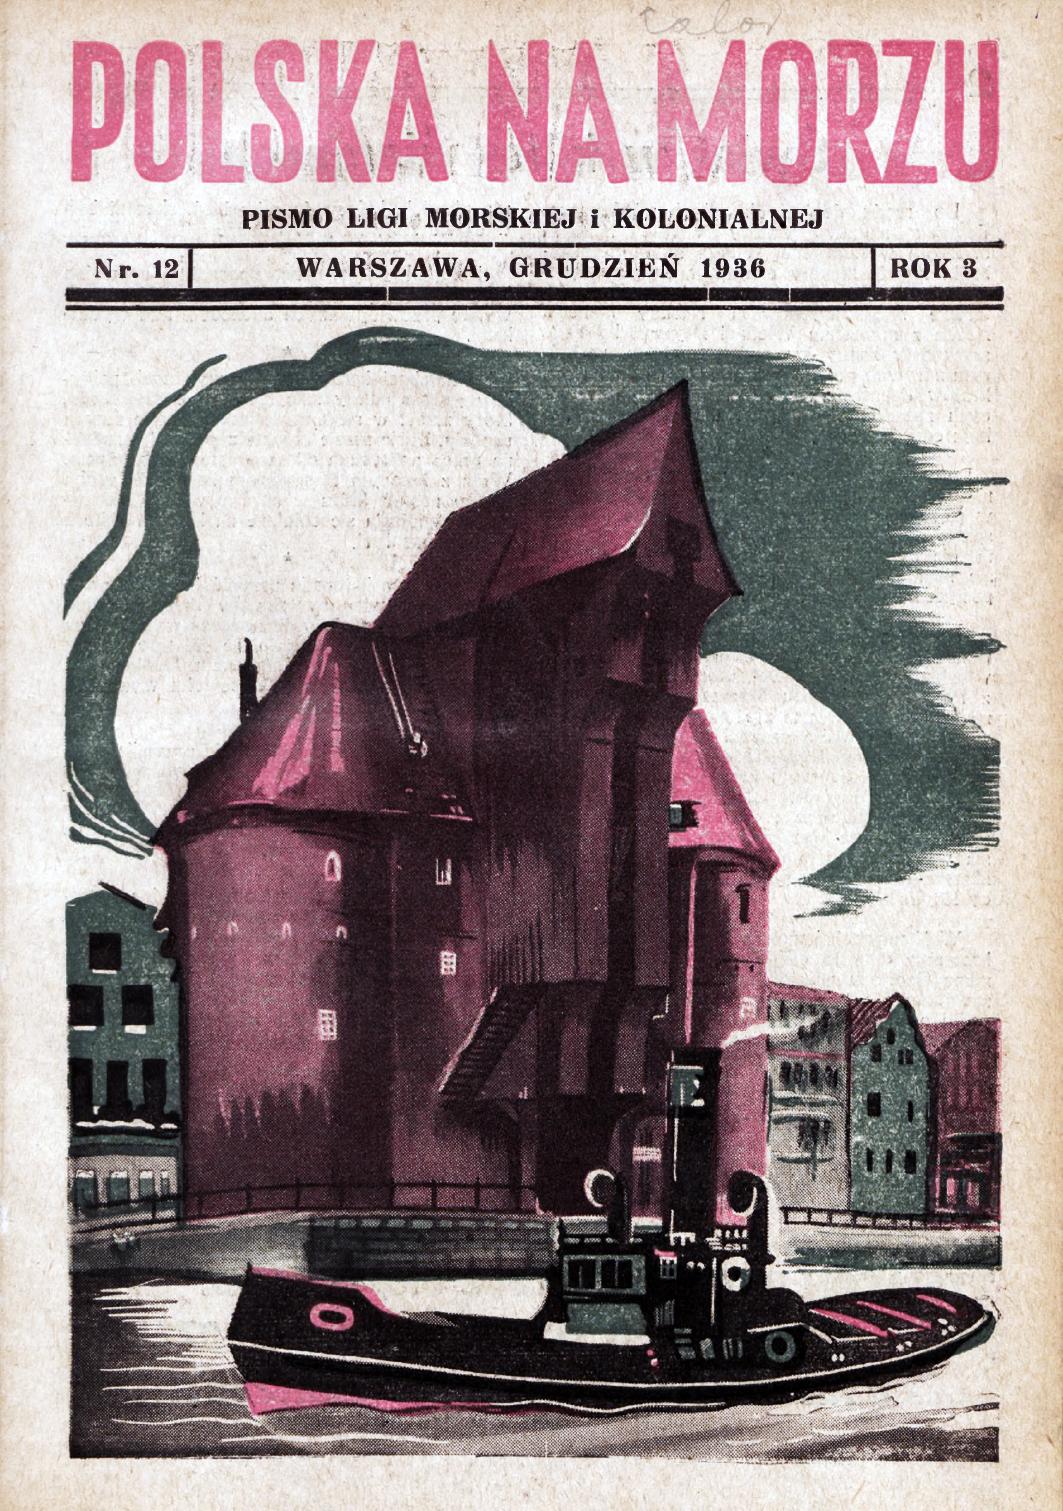 Polska na Morzu : pismo Ligi Morskiej i Kolonjalnej. - Liga Morska i Kolonjalna, 1936, nr 12